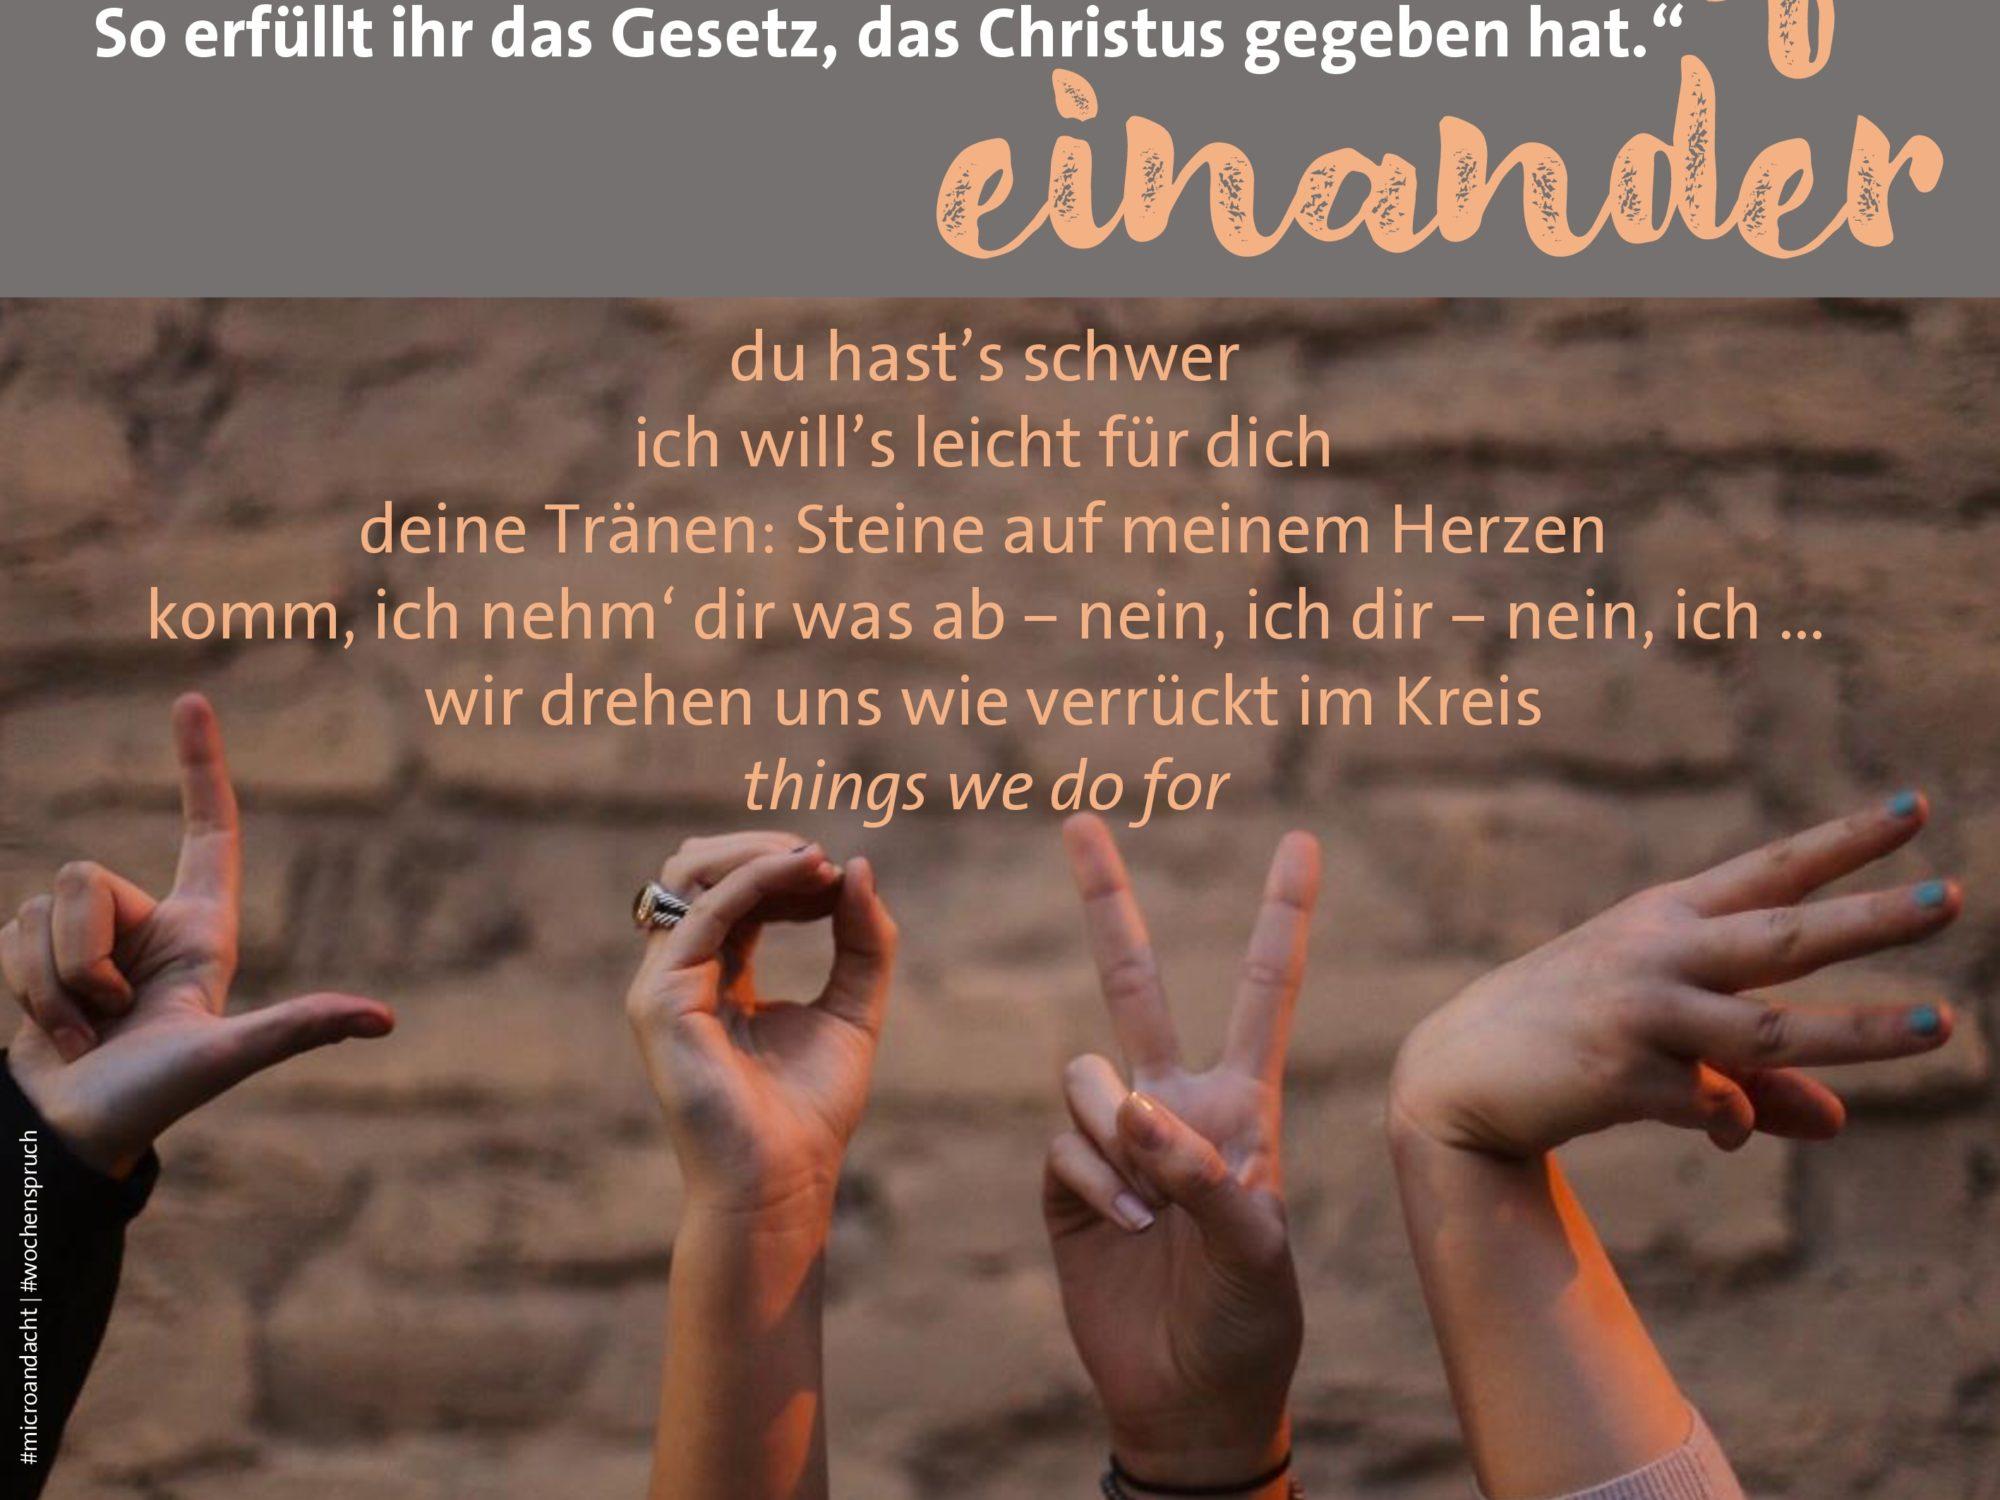 Microandacht zum Wochenspruch von Pfarrerin Julia-Rebecca Riedel.